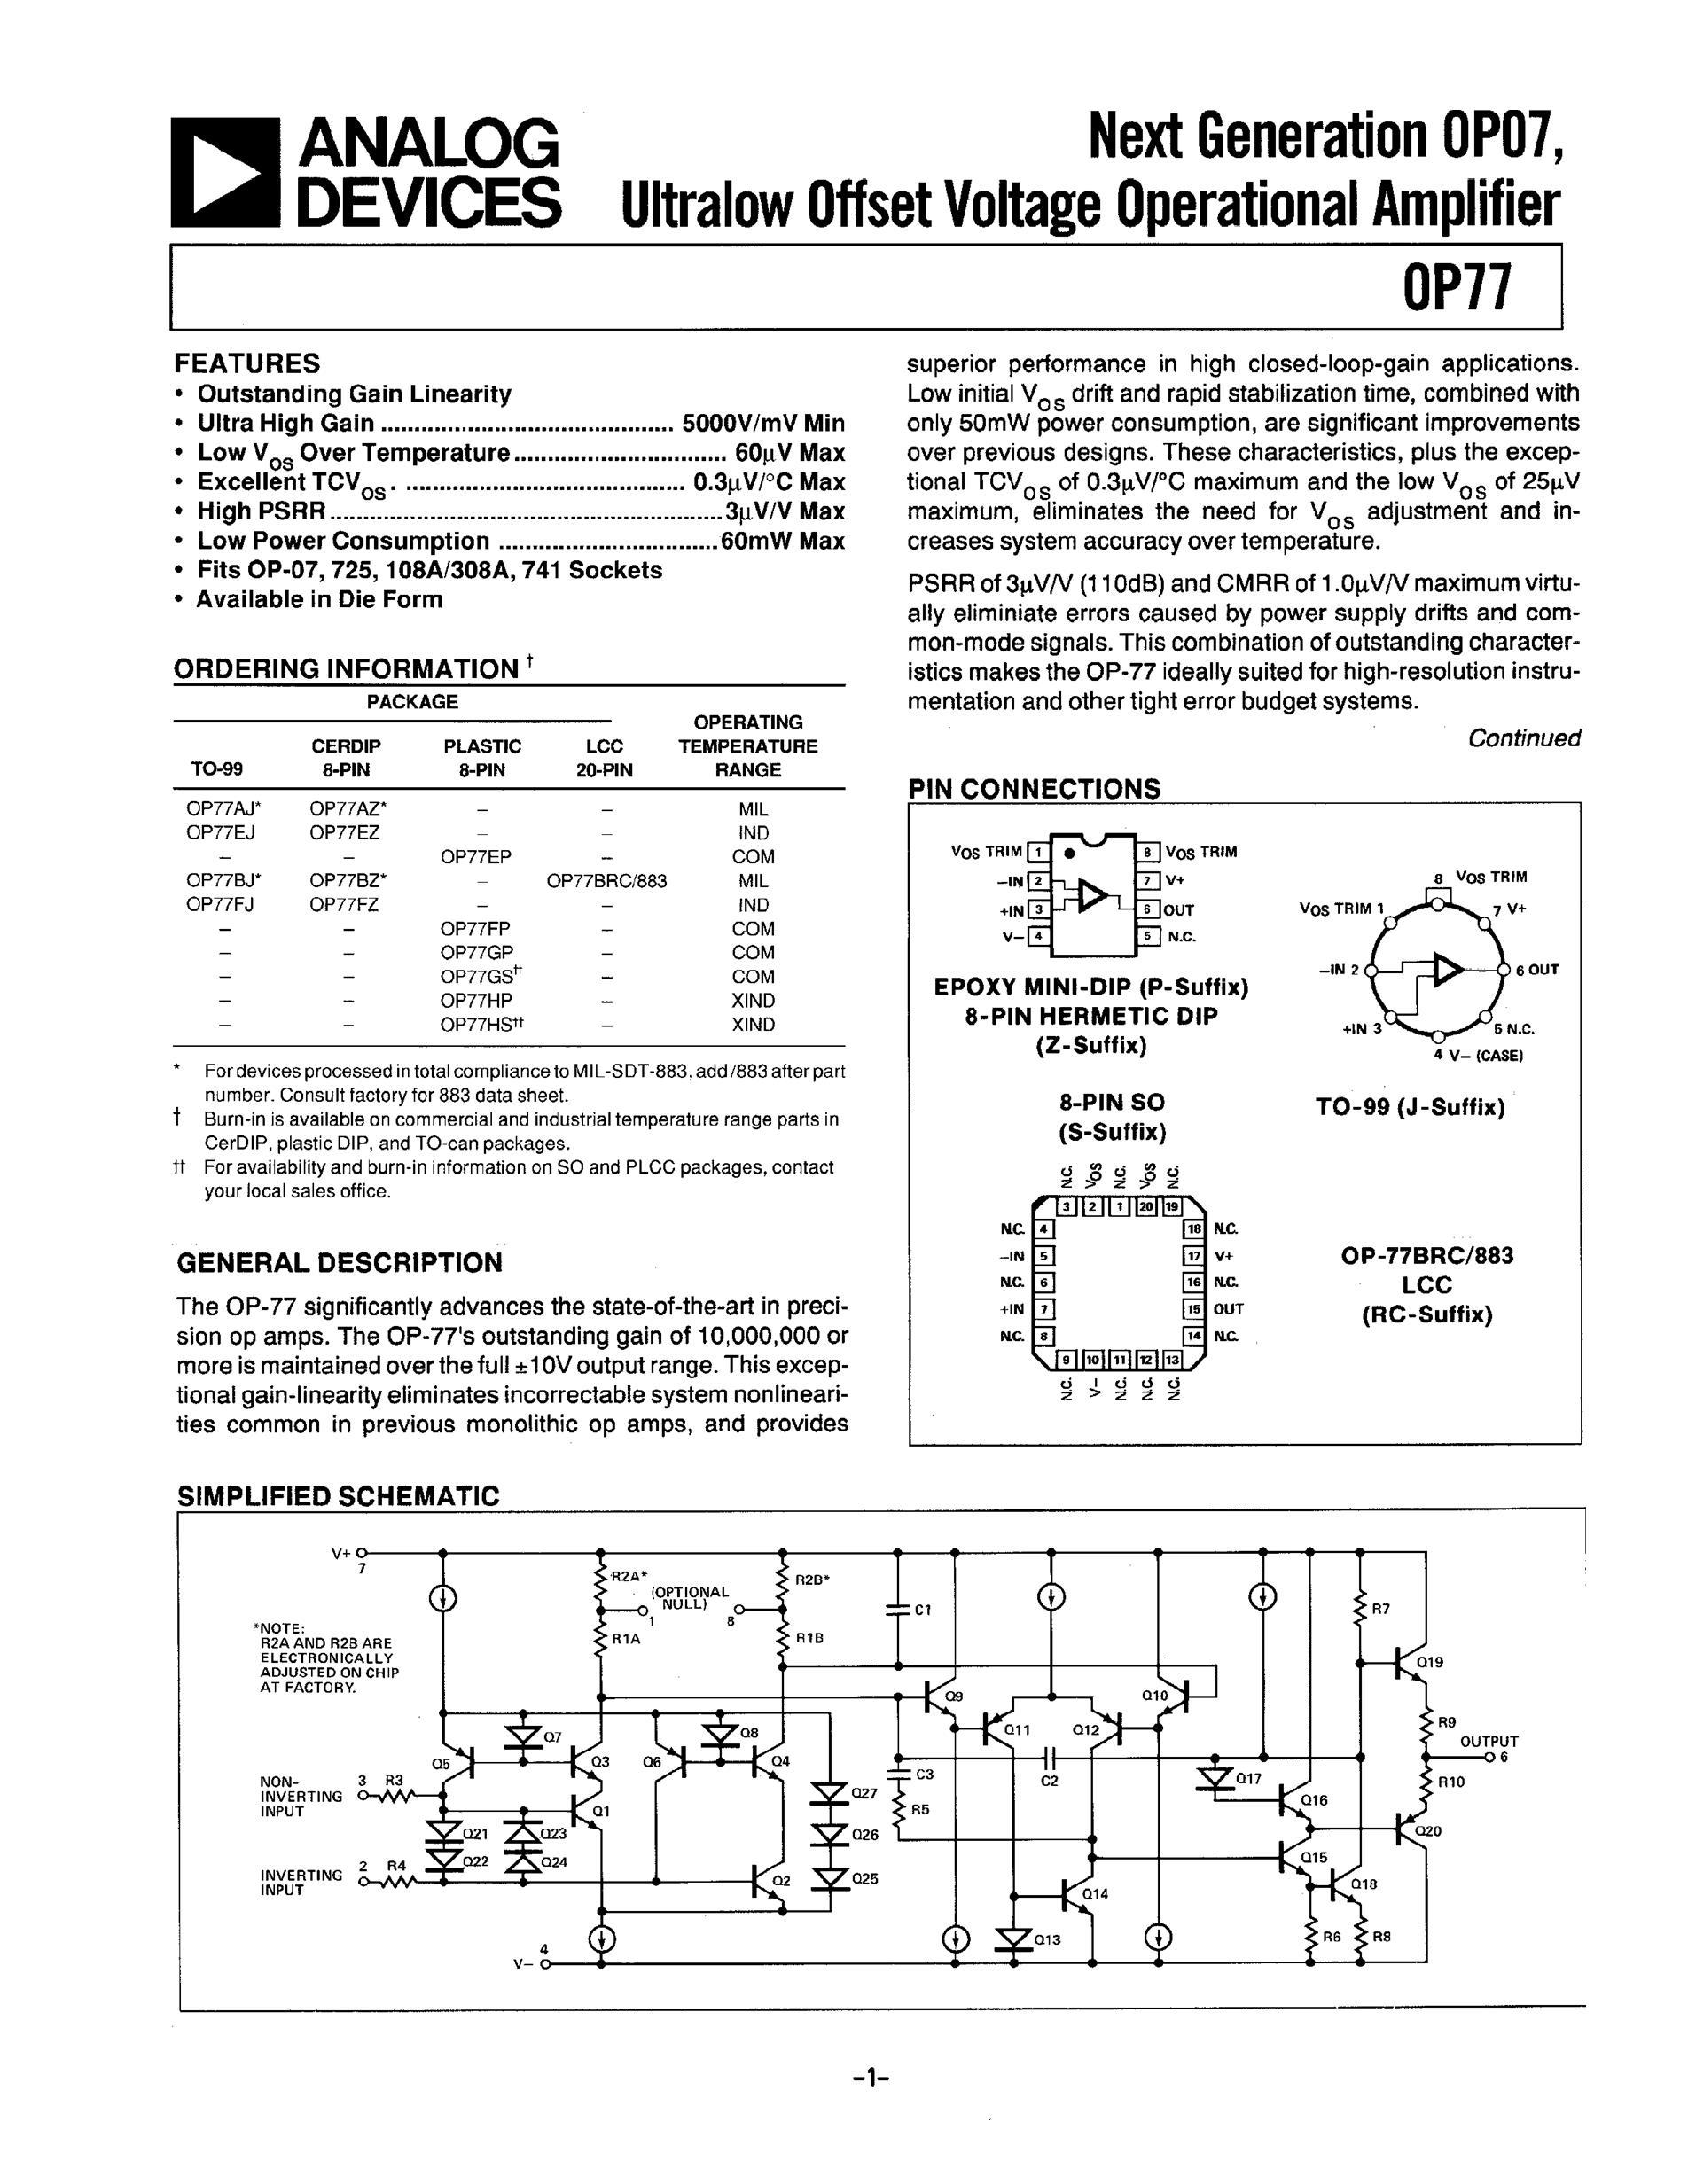 OP77GS's pdf picture 1